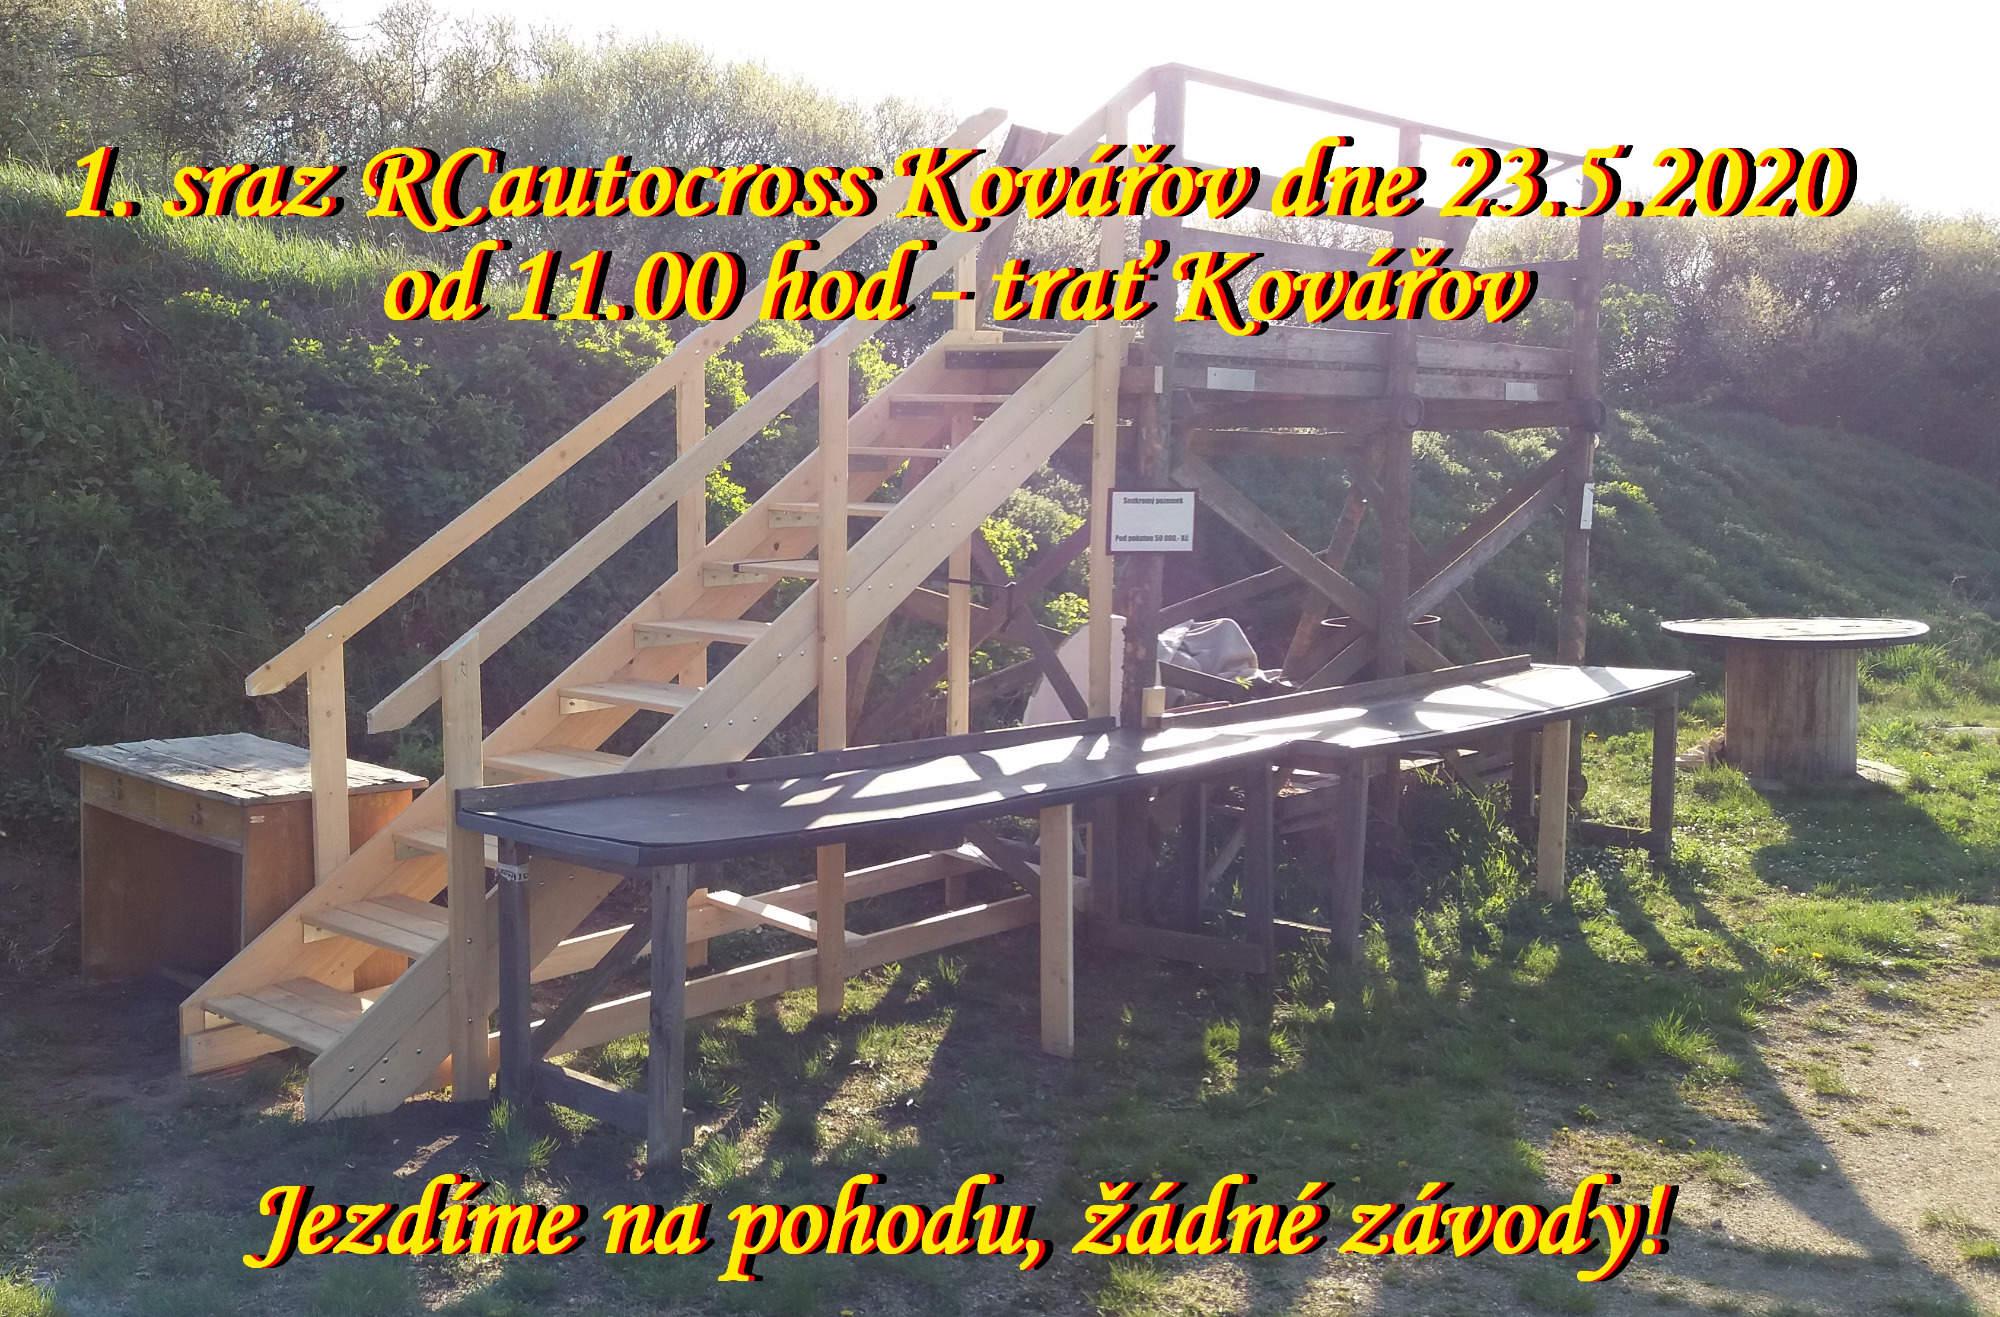 https://img24.rajce.idnes.cz/d2402/13/13870/13870315_ebc8da28dec63b155baae591a881c905/images/1.sraz2020.jpg?ver=0